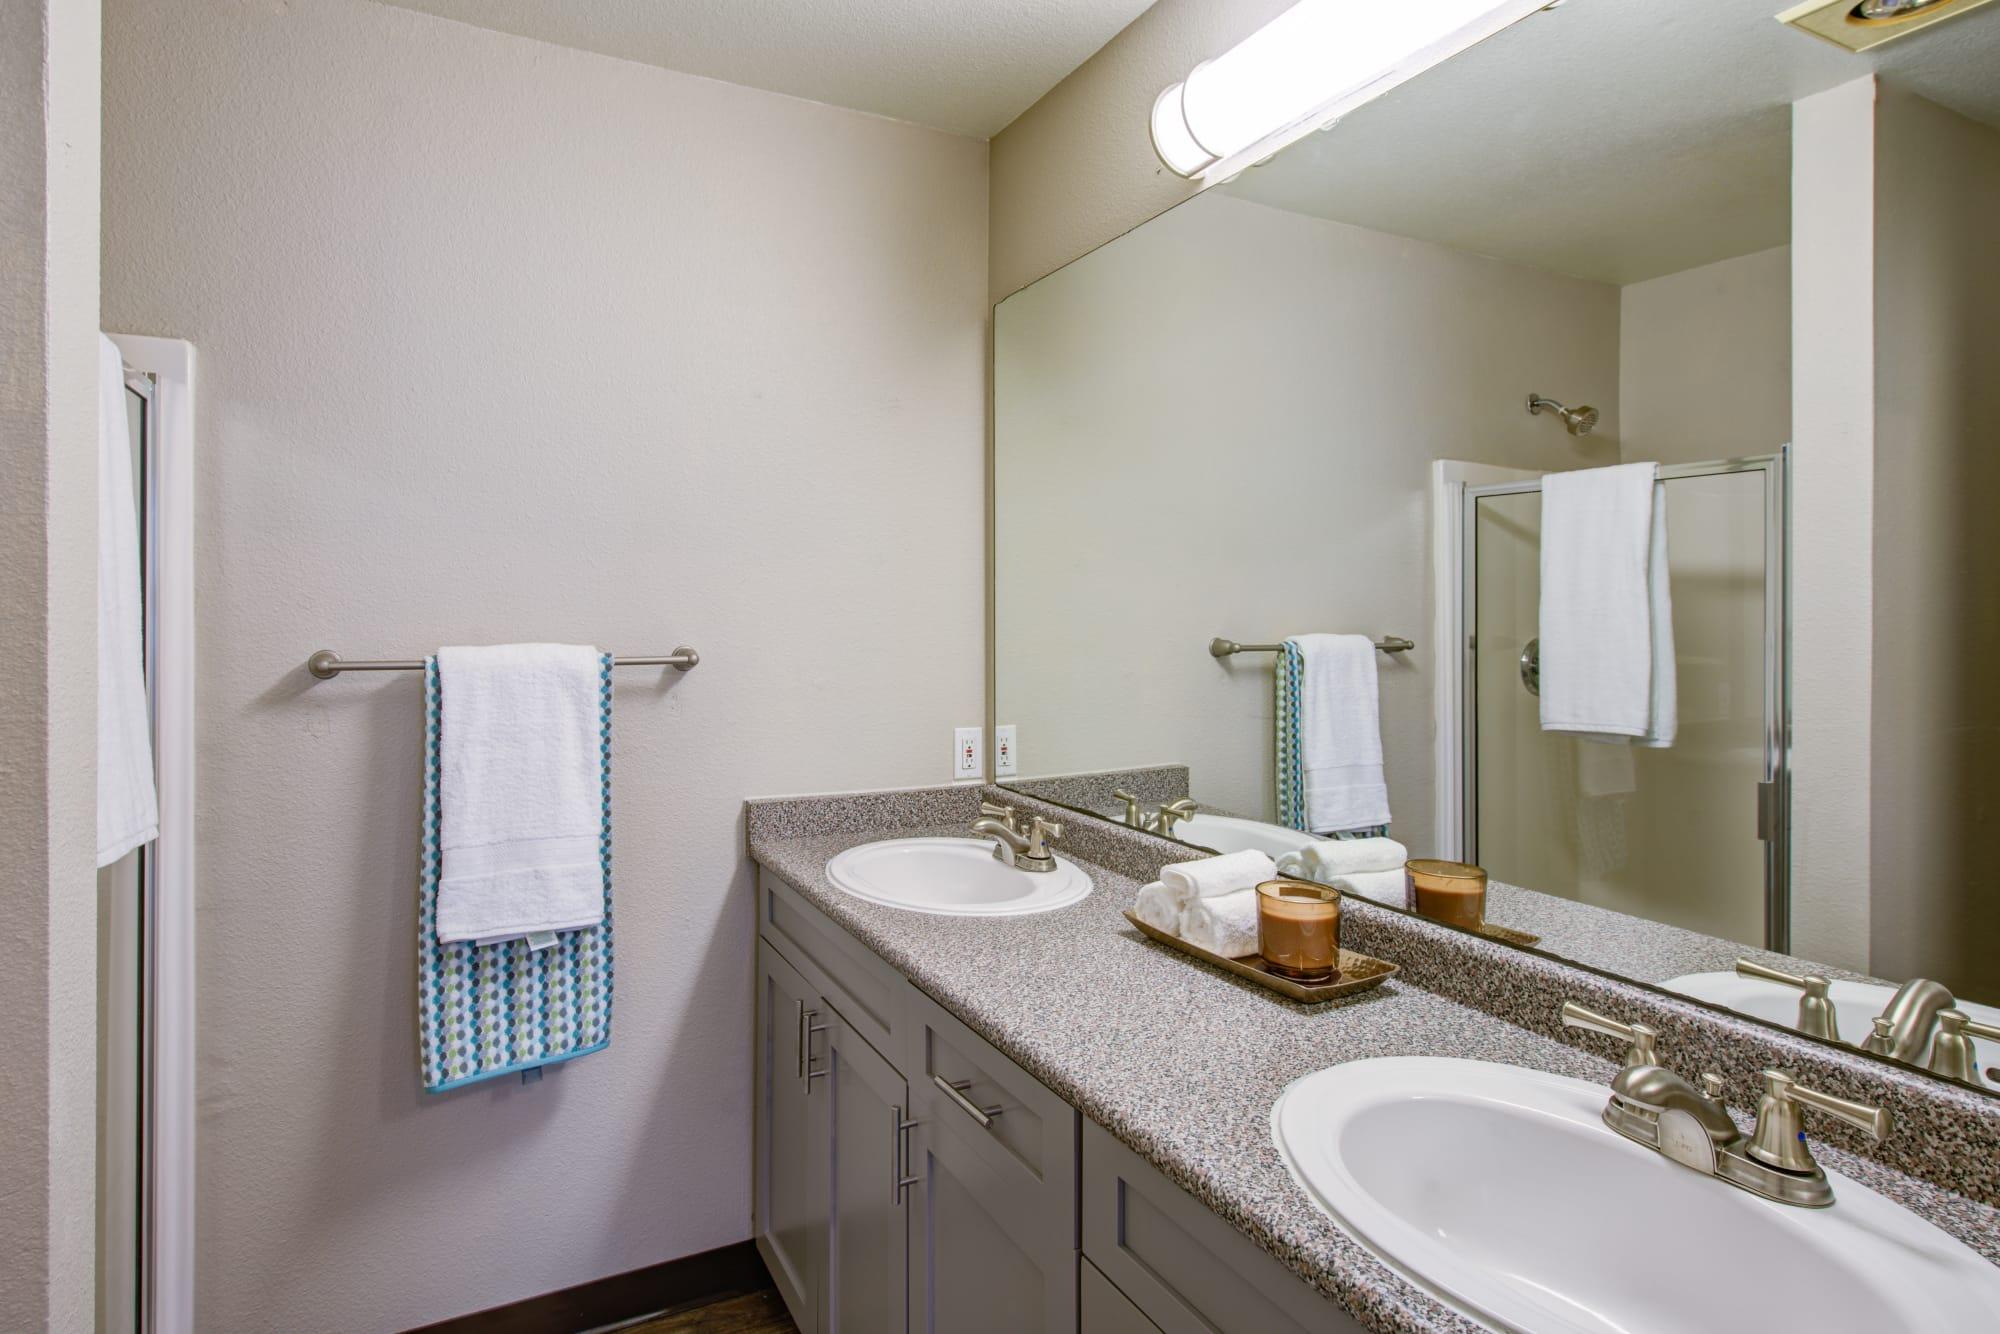 model bathroom withgrey cabinetry